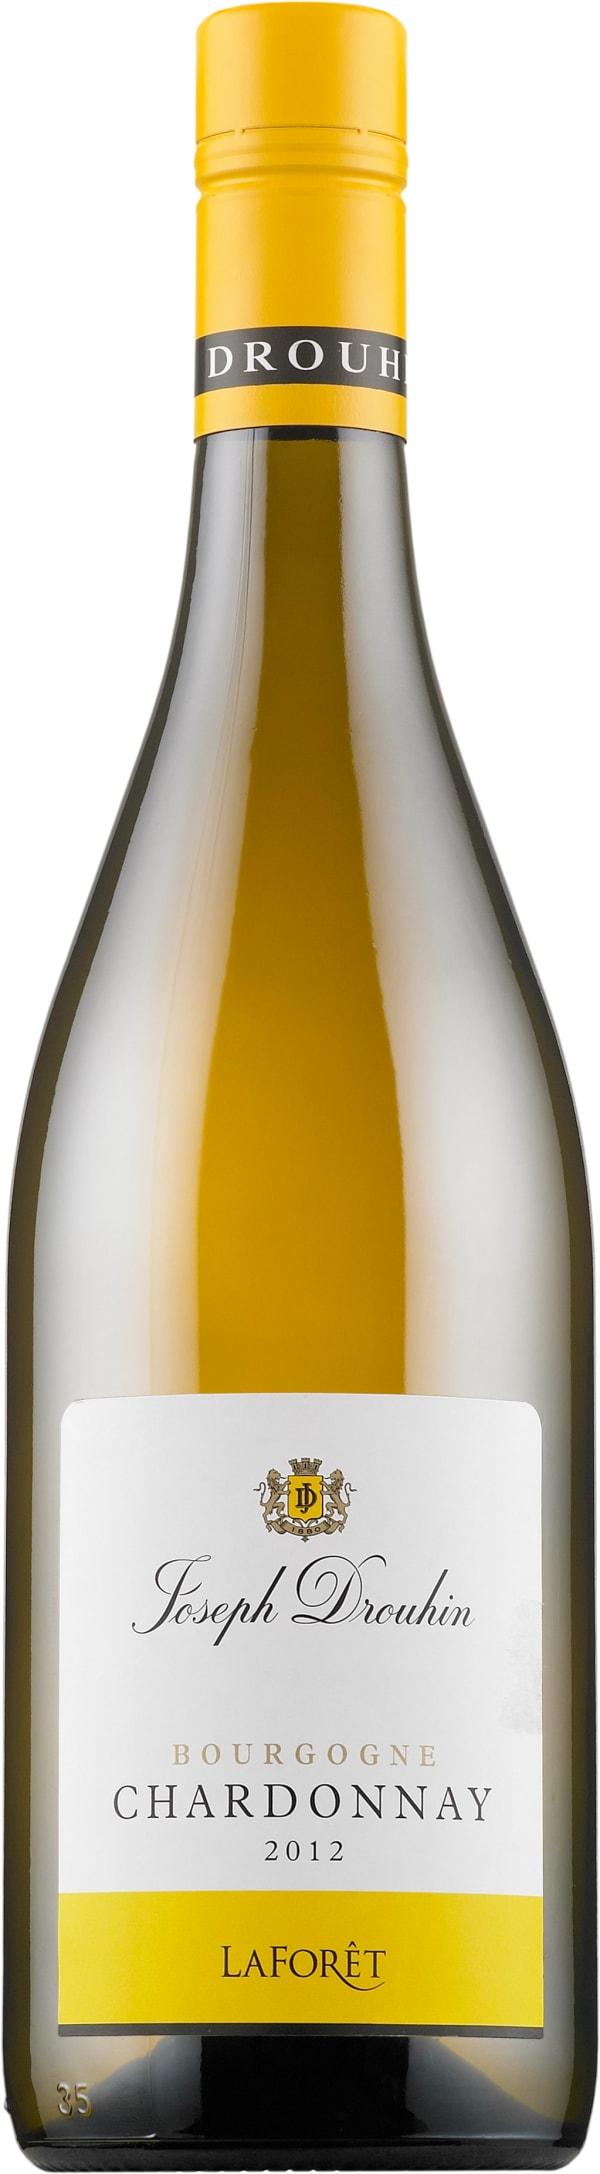 Joseph Drouhin Laforêt Chardonnay 2018